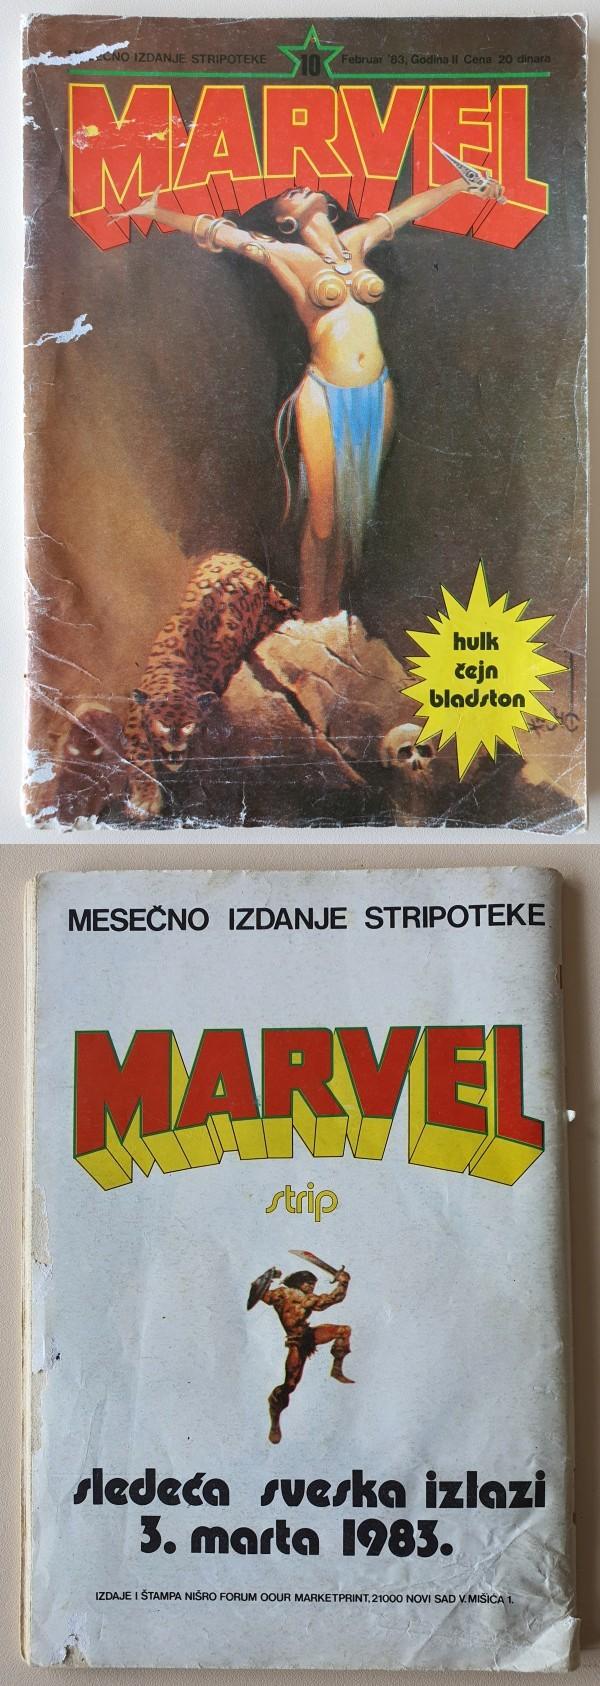 Marvel 10 (Forum-Marketprint)